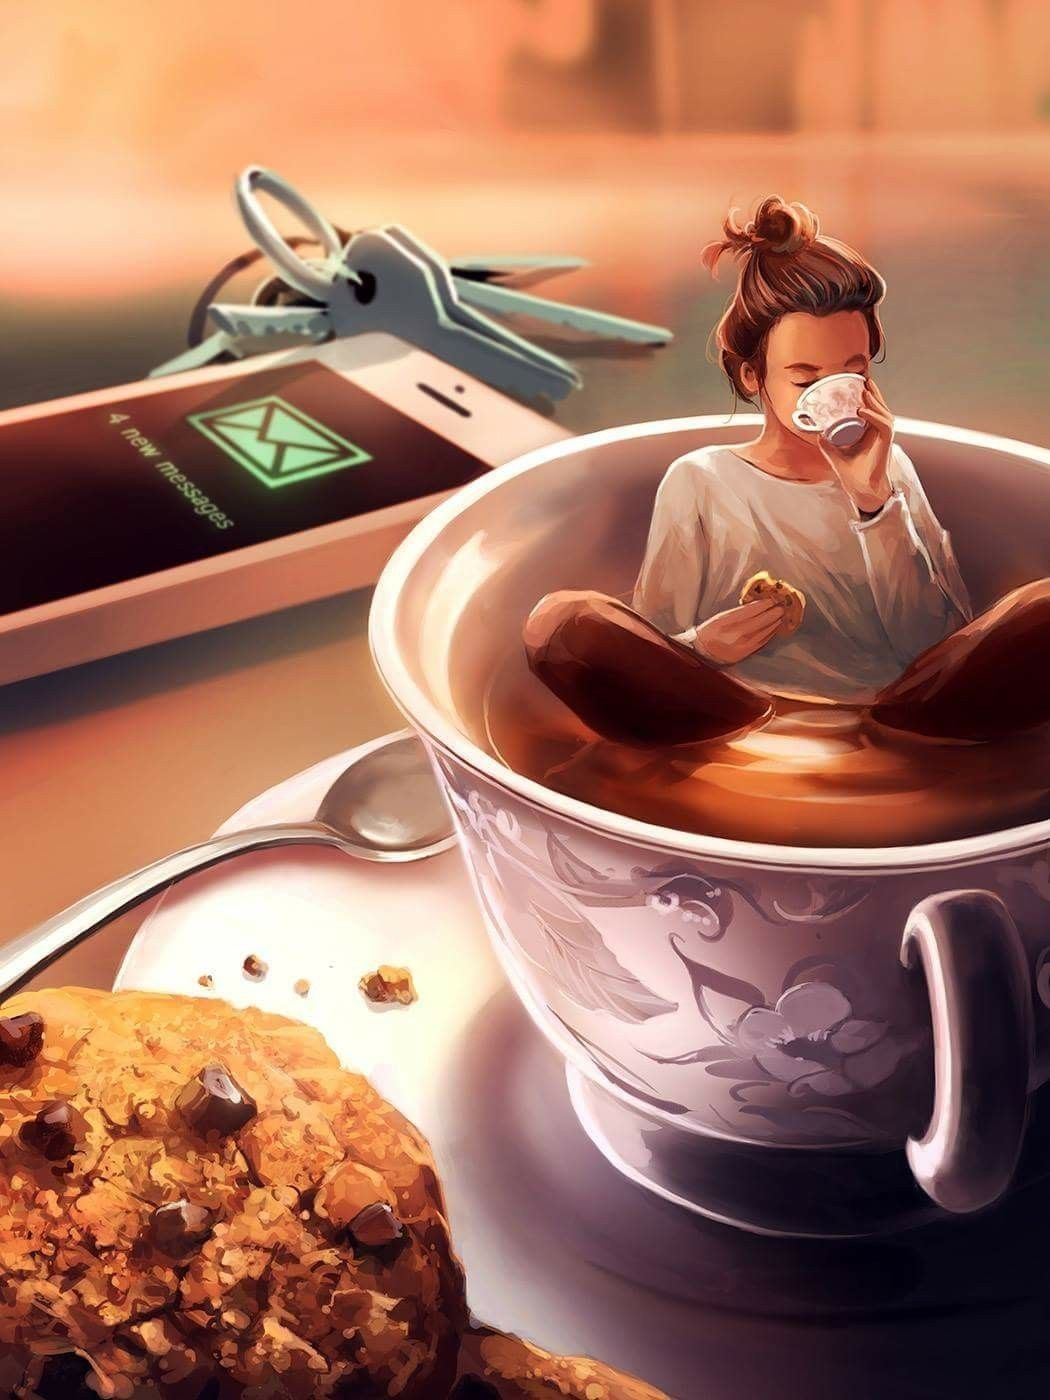 Image by Cindy Gomes on Anime Art & Fantasy Art Cute art